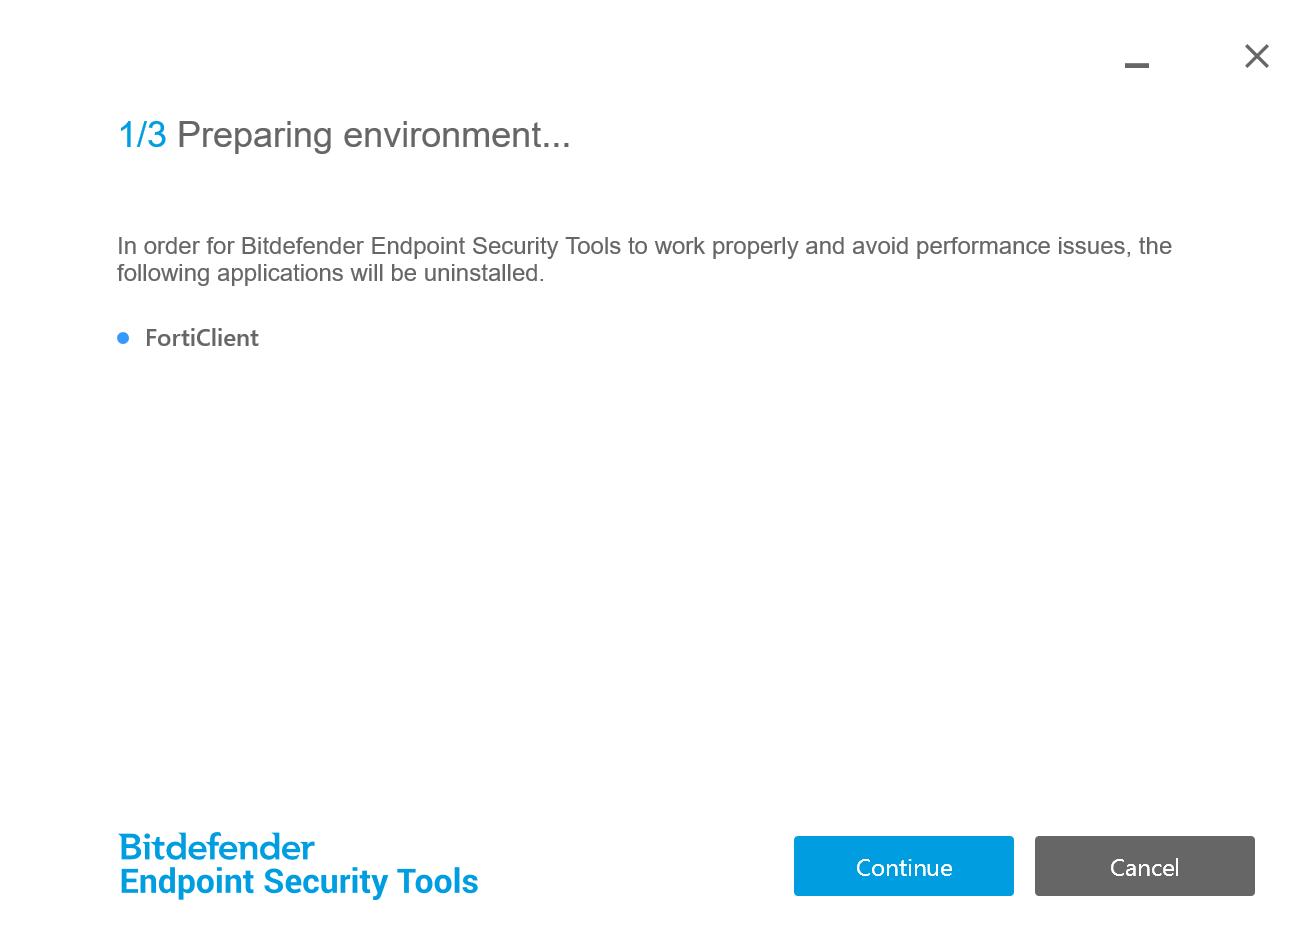 Bitdefender Gravityzone installer removes Forticlient VPN - How to